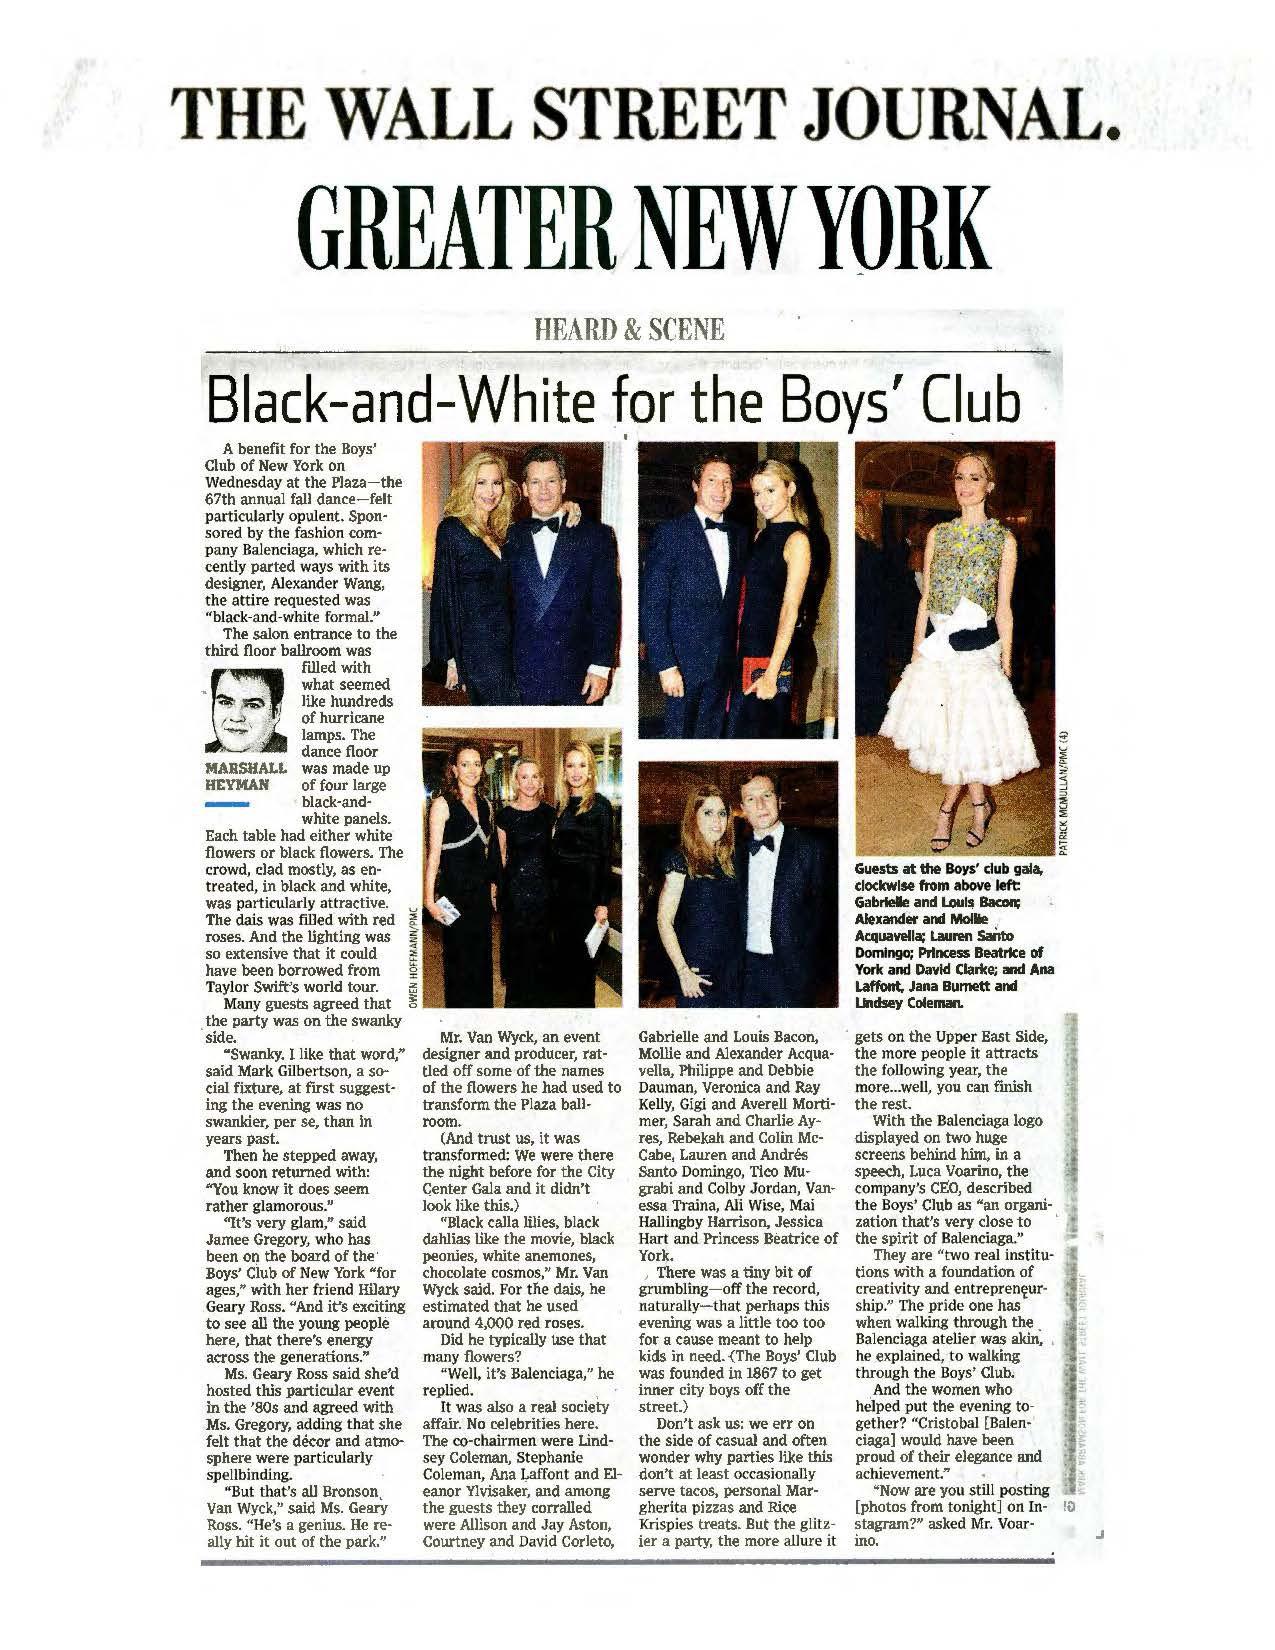 WSJ_Boys'Club - edit 4.jpg